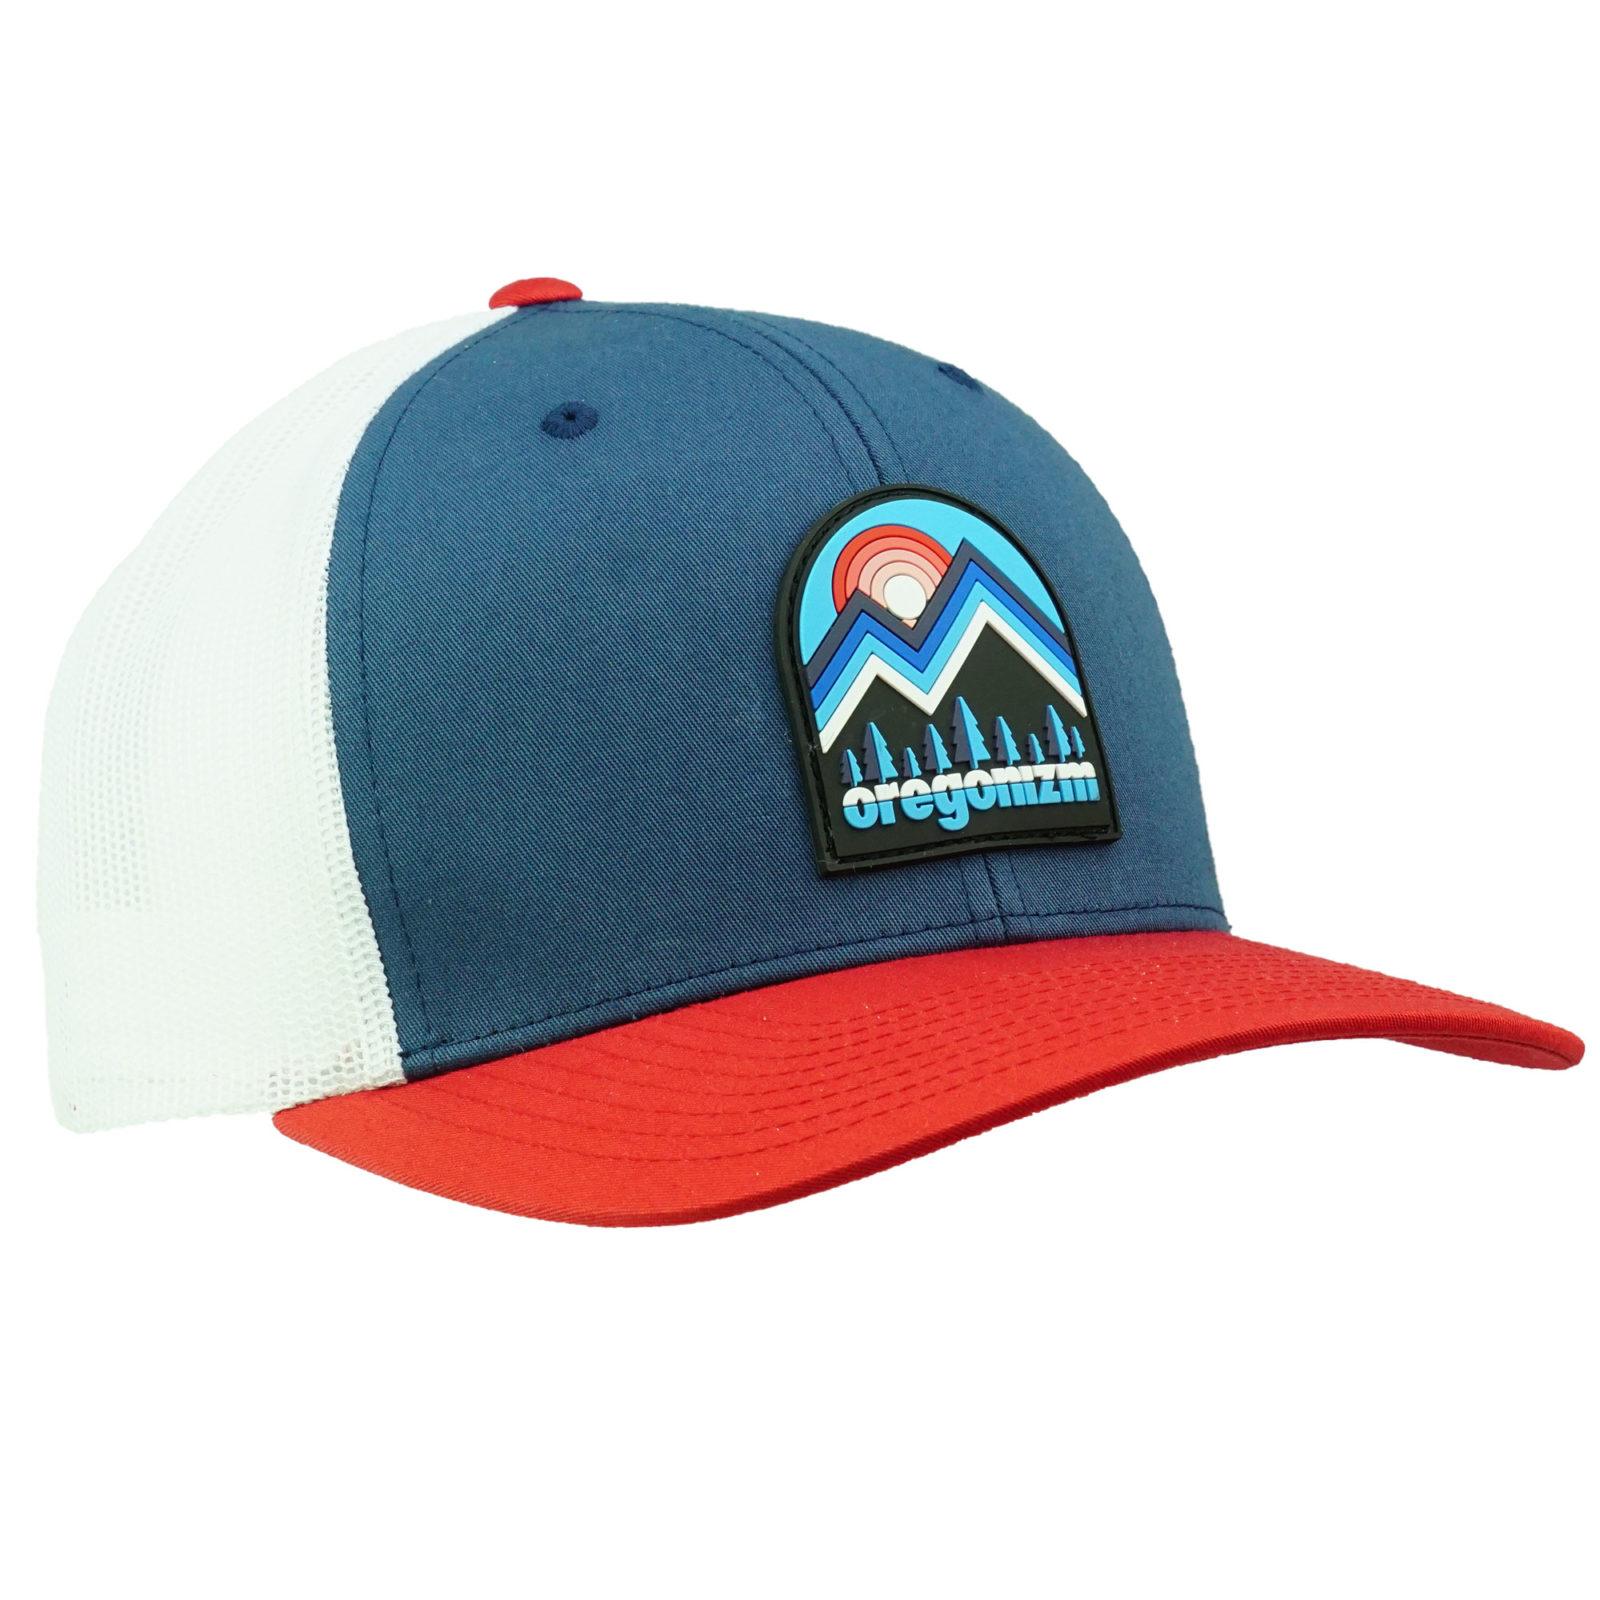 oregonizm-hat-mountainscape-mesh-rwb-primary